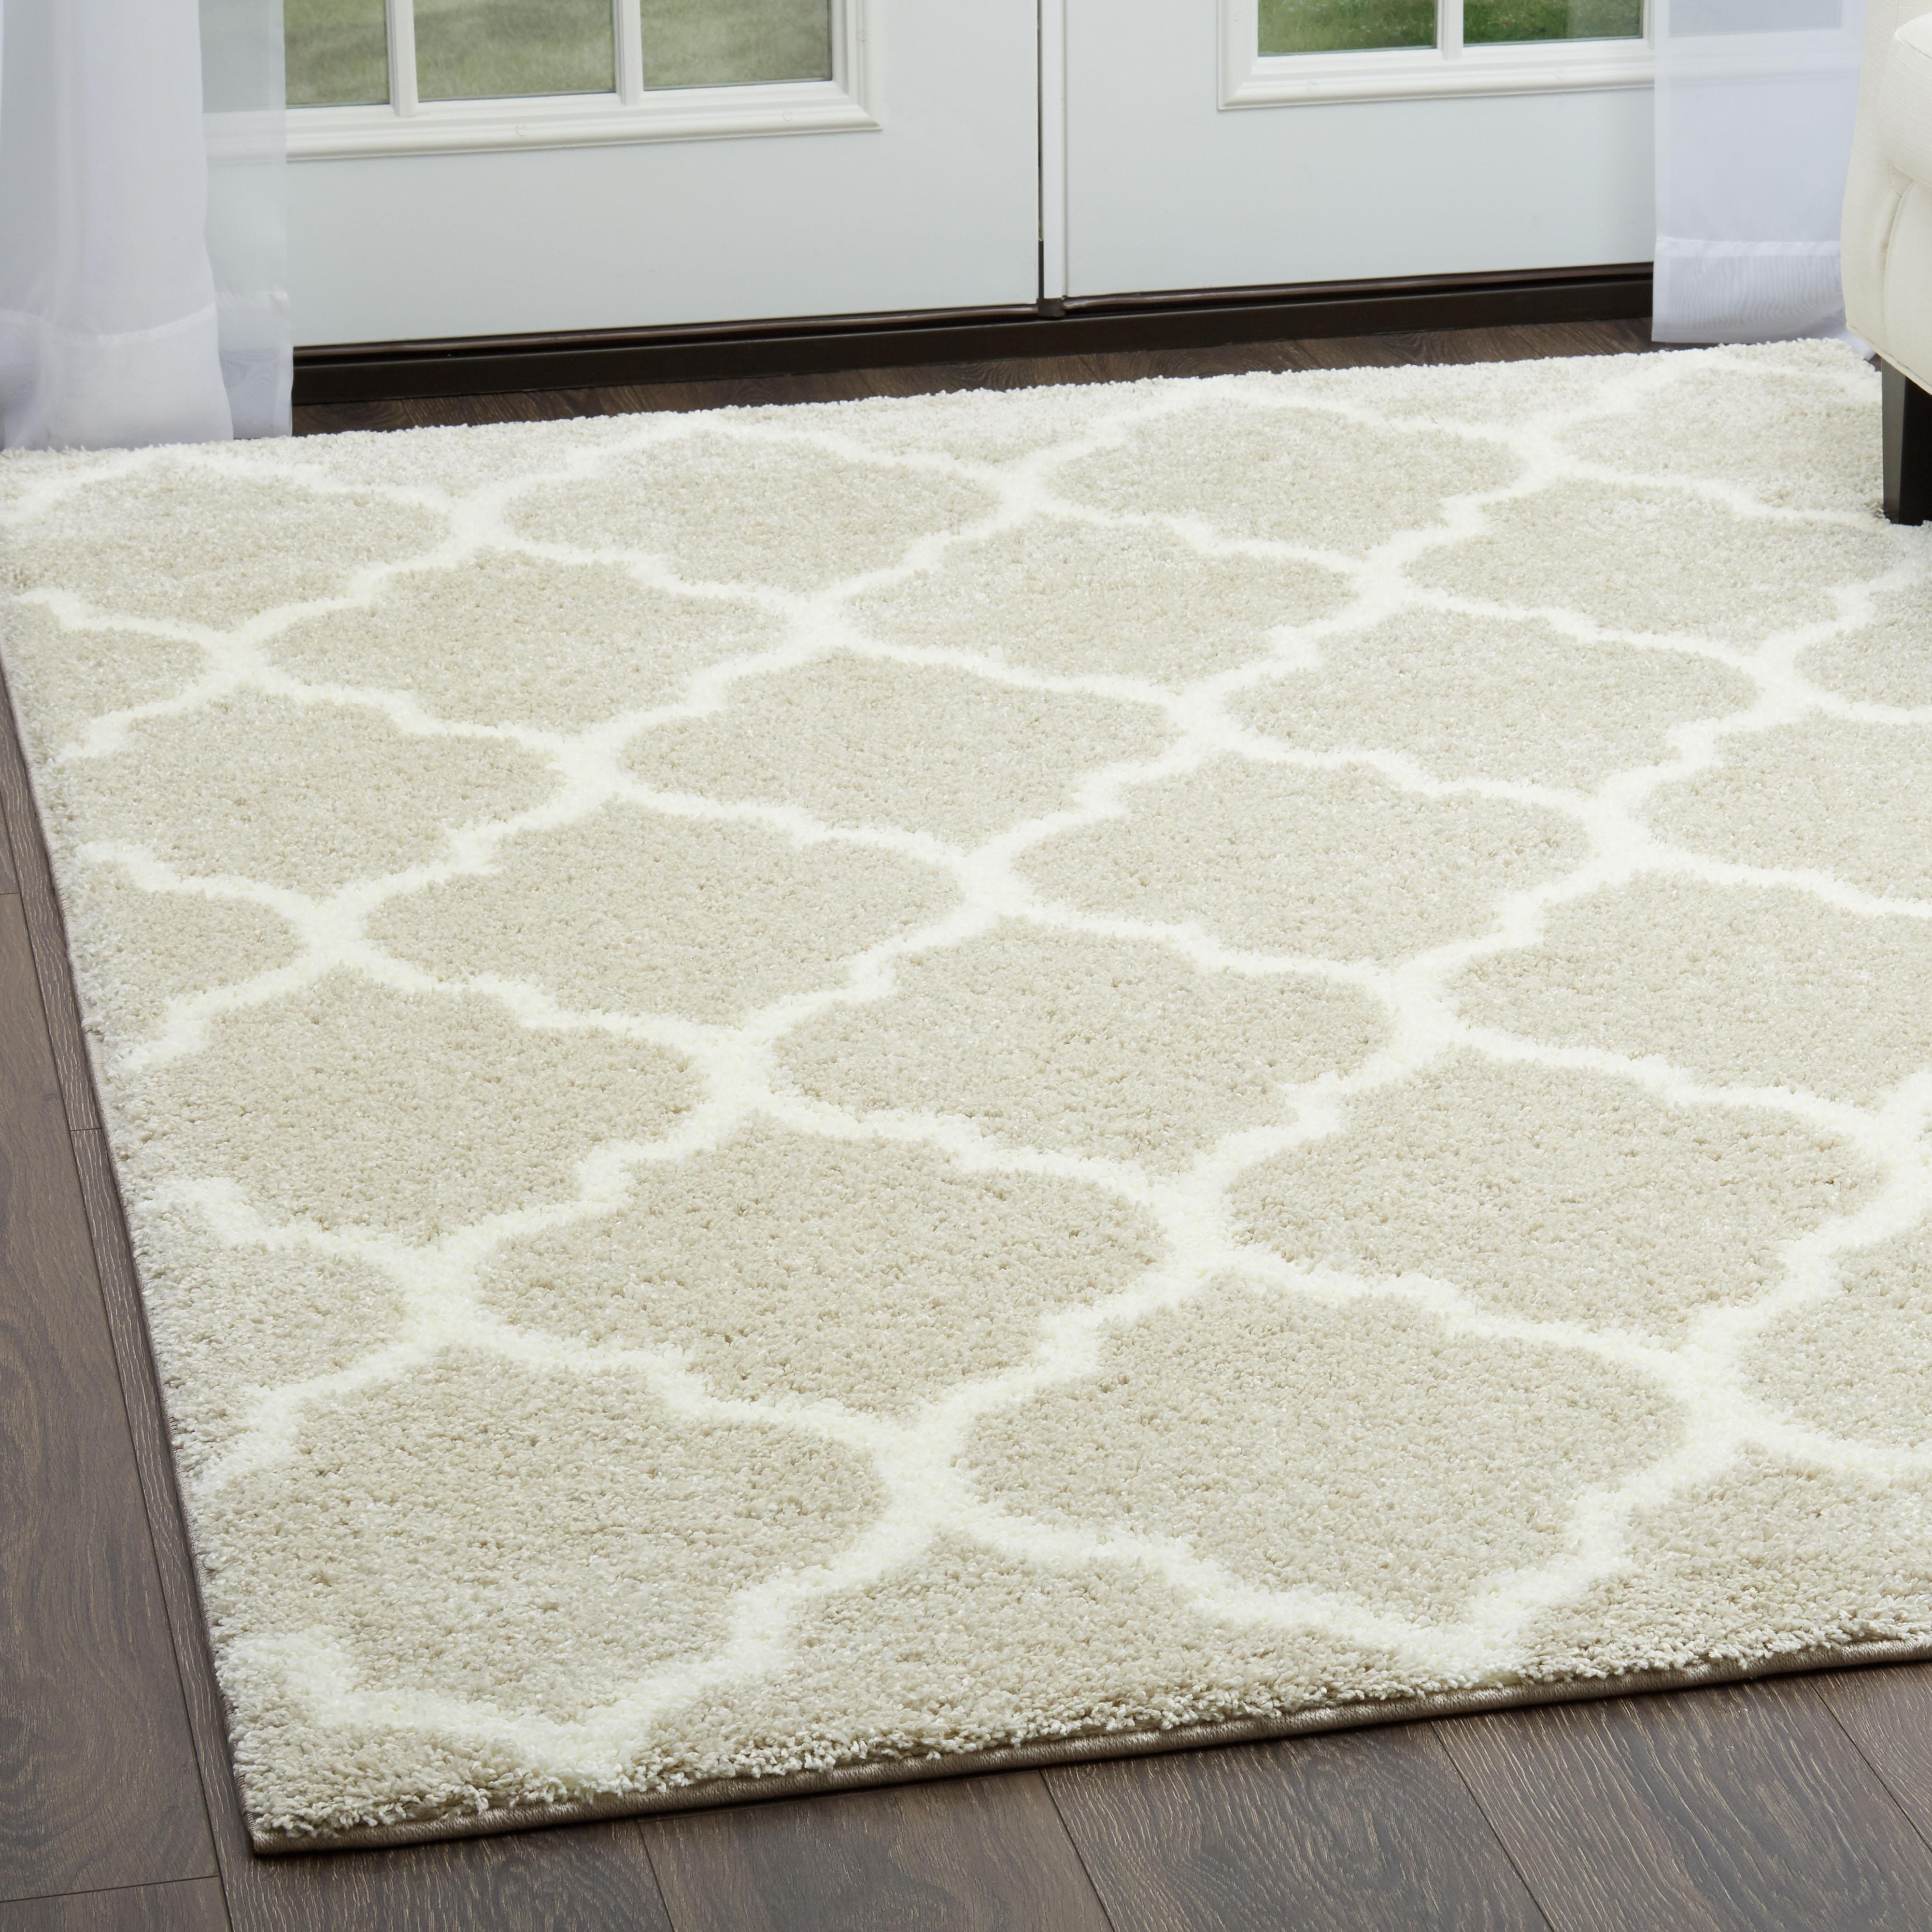 Modern Quatrefoil Moroccan Trellis Lattice Floor Decor Carpet - Www floordecor com